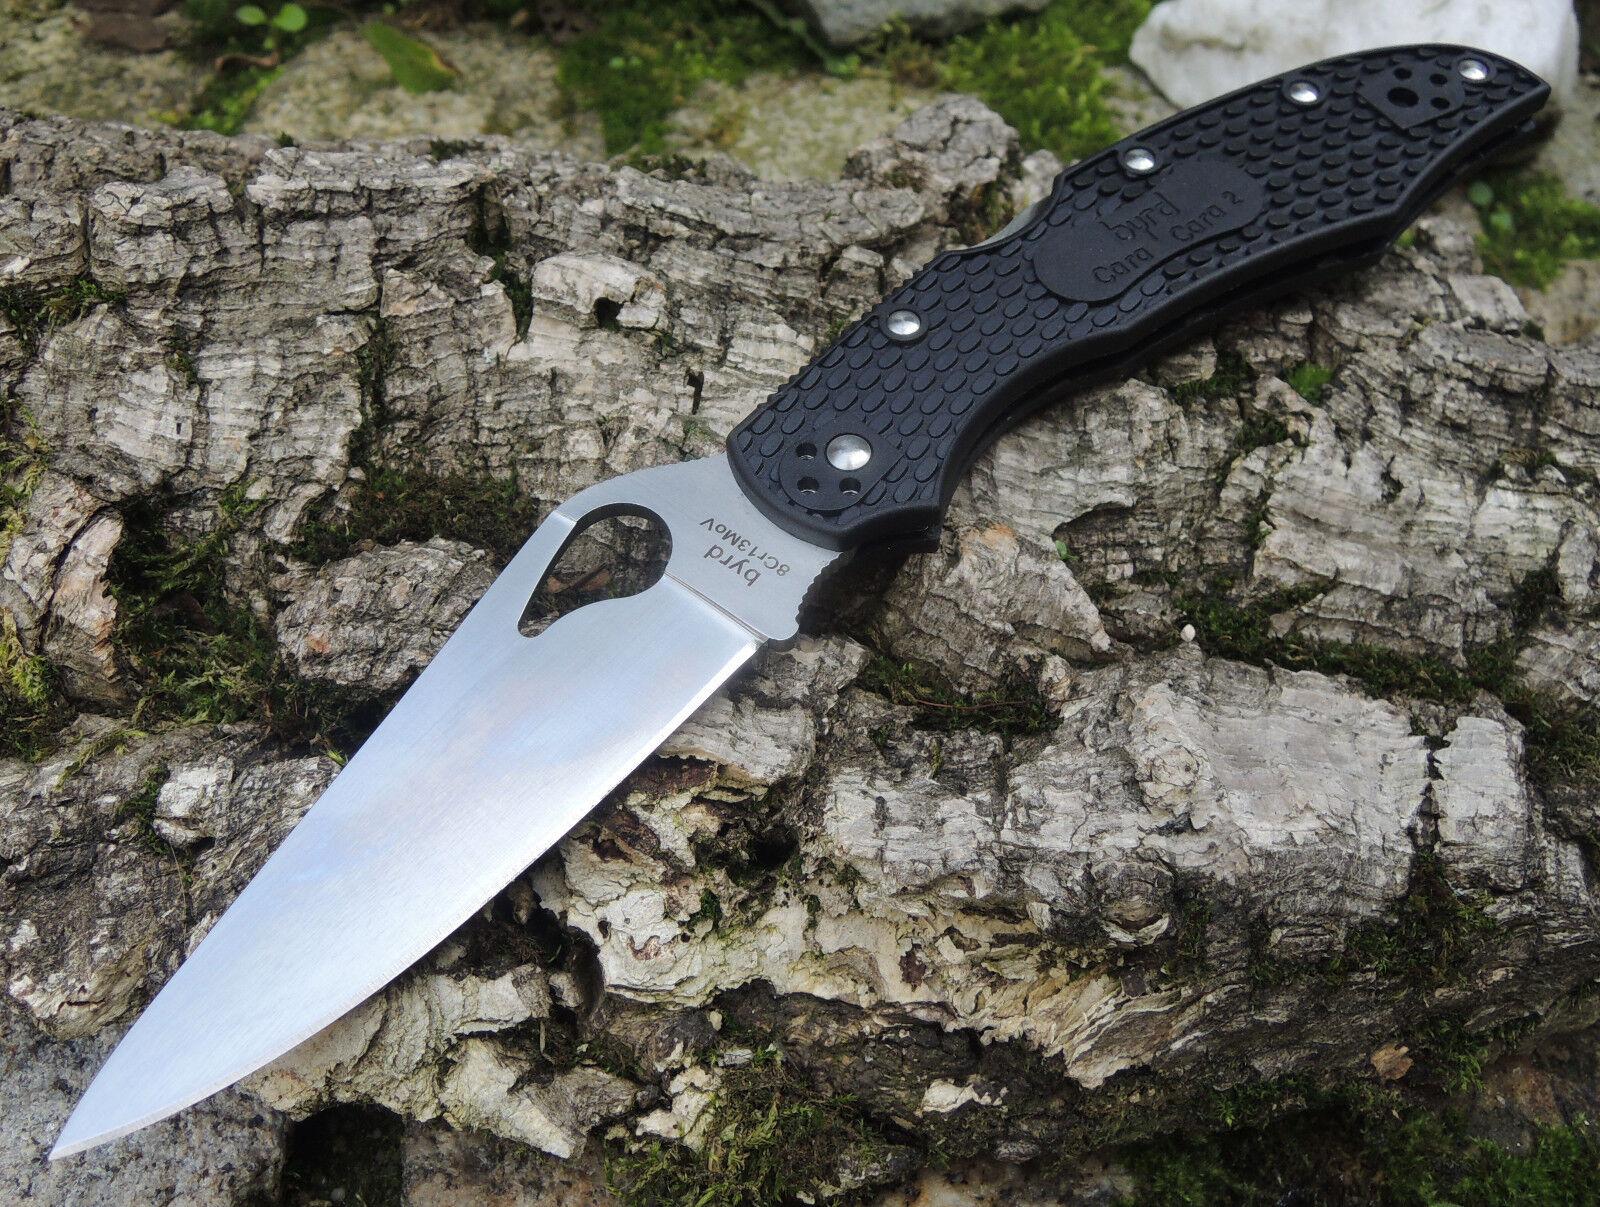 Spyderco BYRD CARA CARA Messer Taschenmesser 8Cr13MoV Stahl FRN Griff